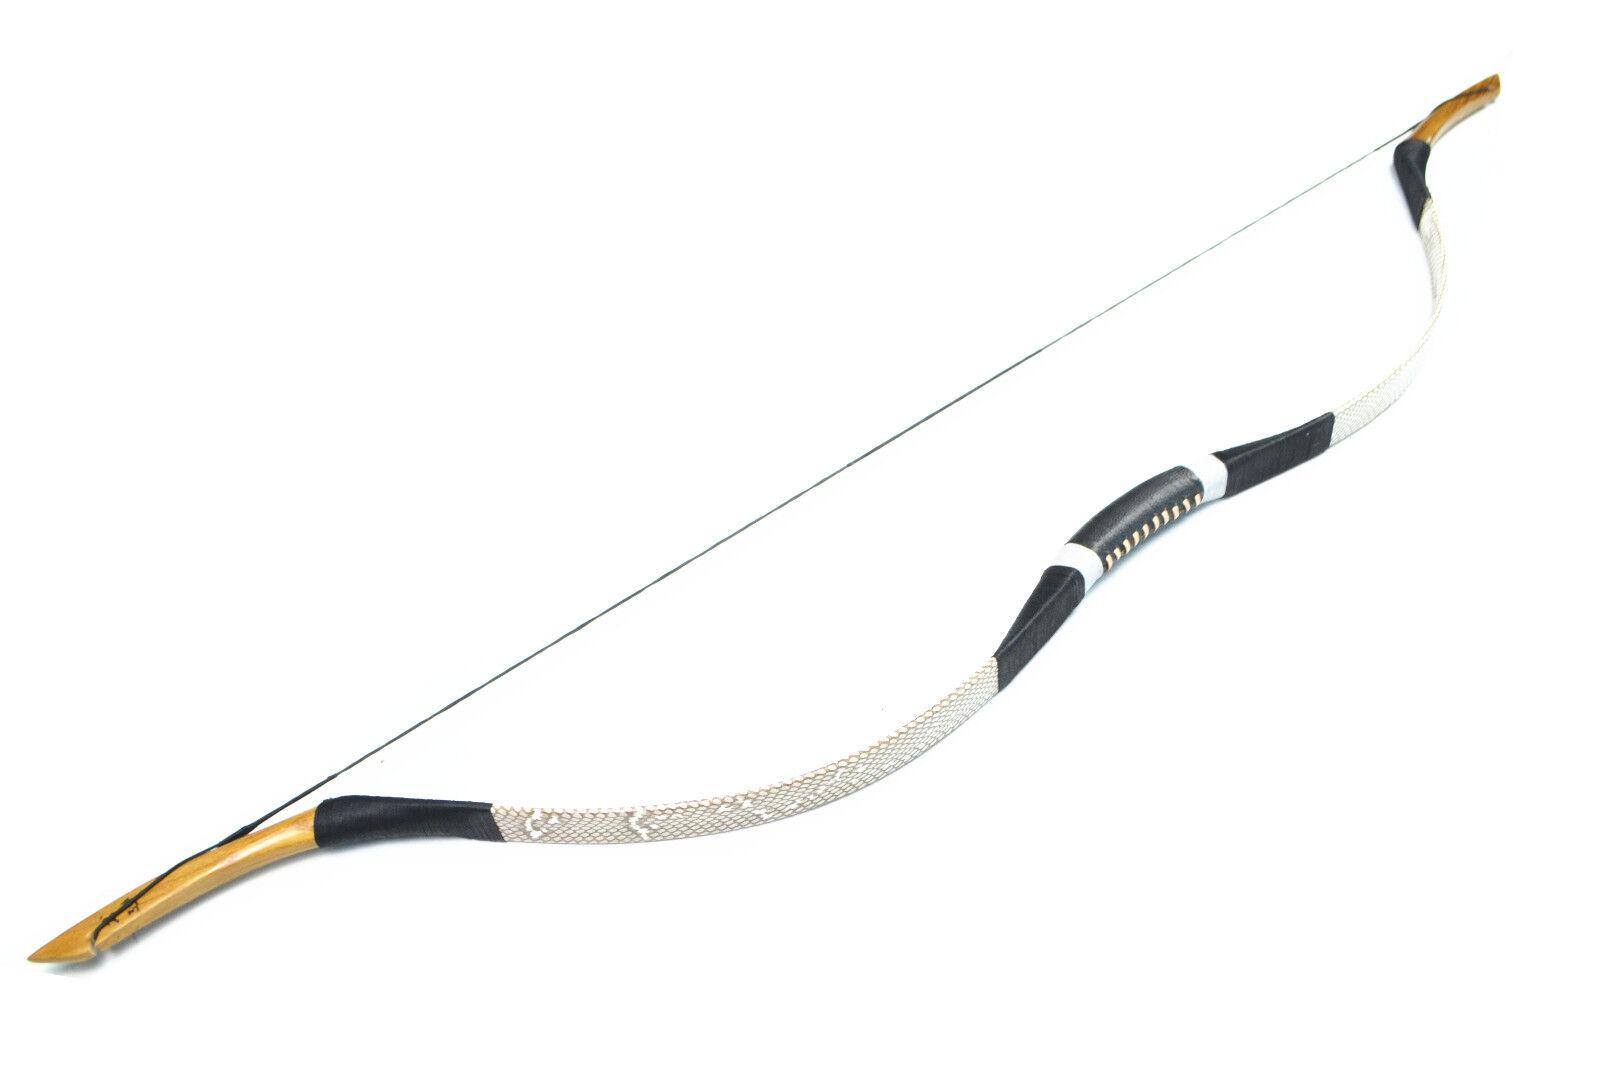 Af tiro con arco 20-100 hanbow Arco Recurvo Arco blancoo De Fibra De Vidrio